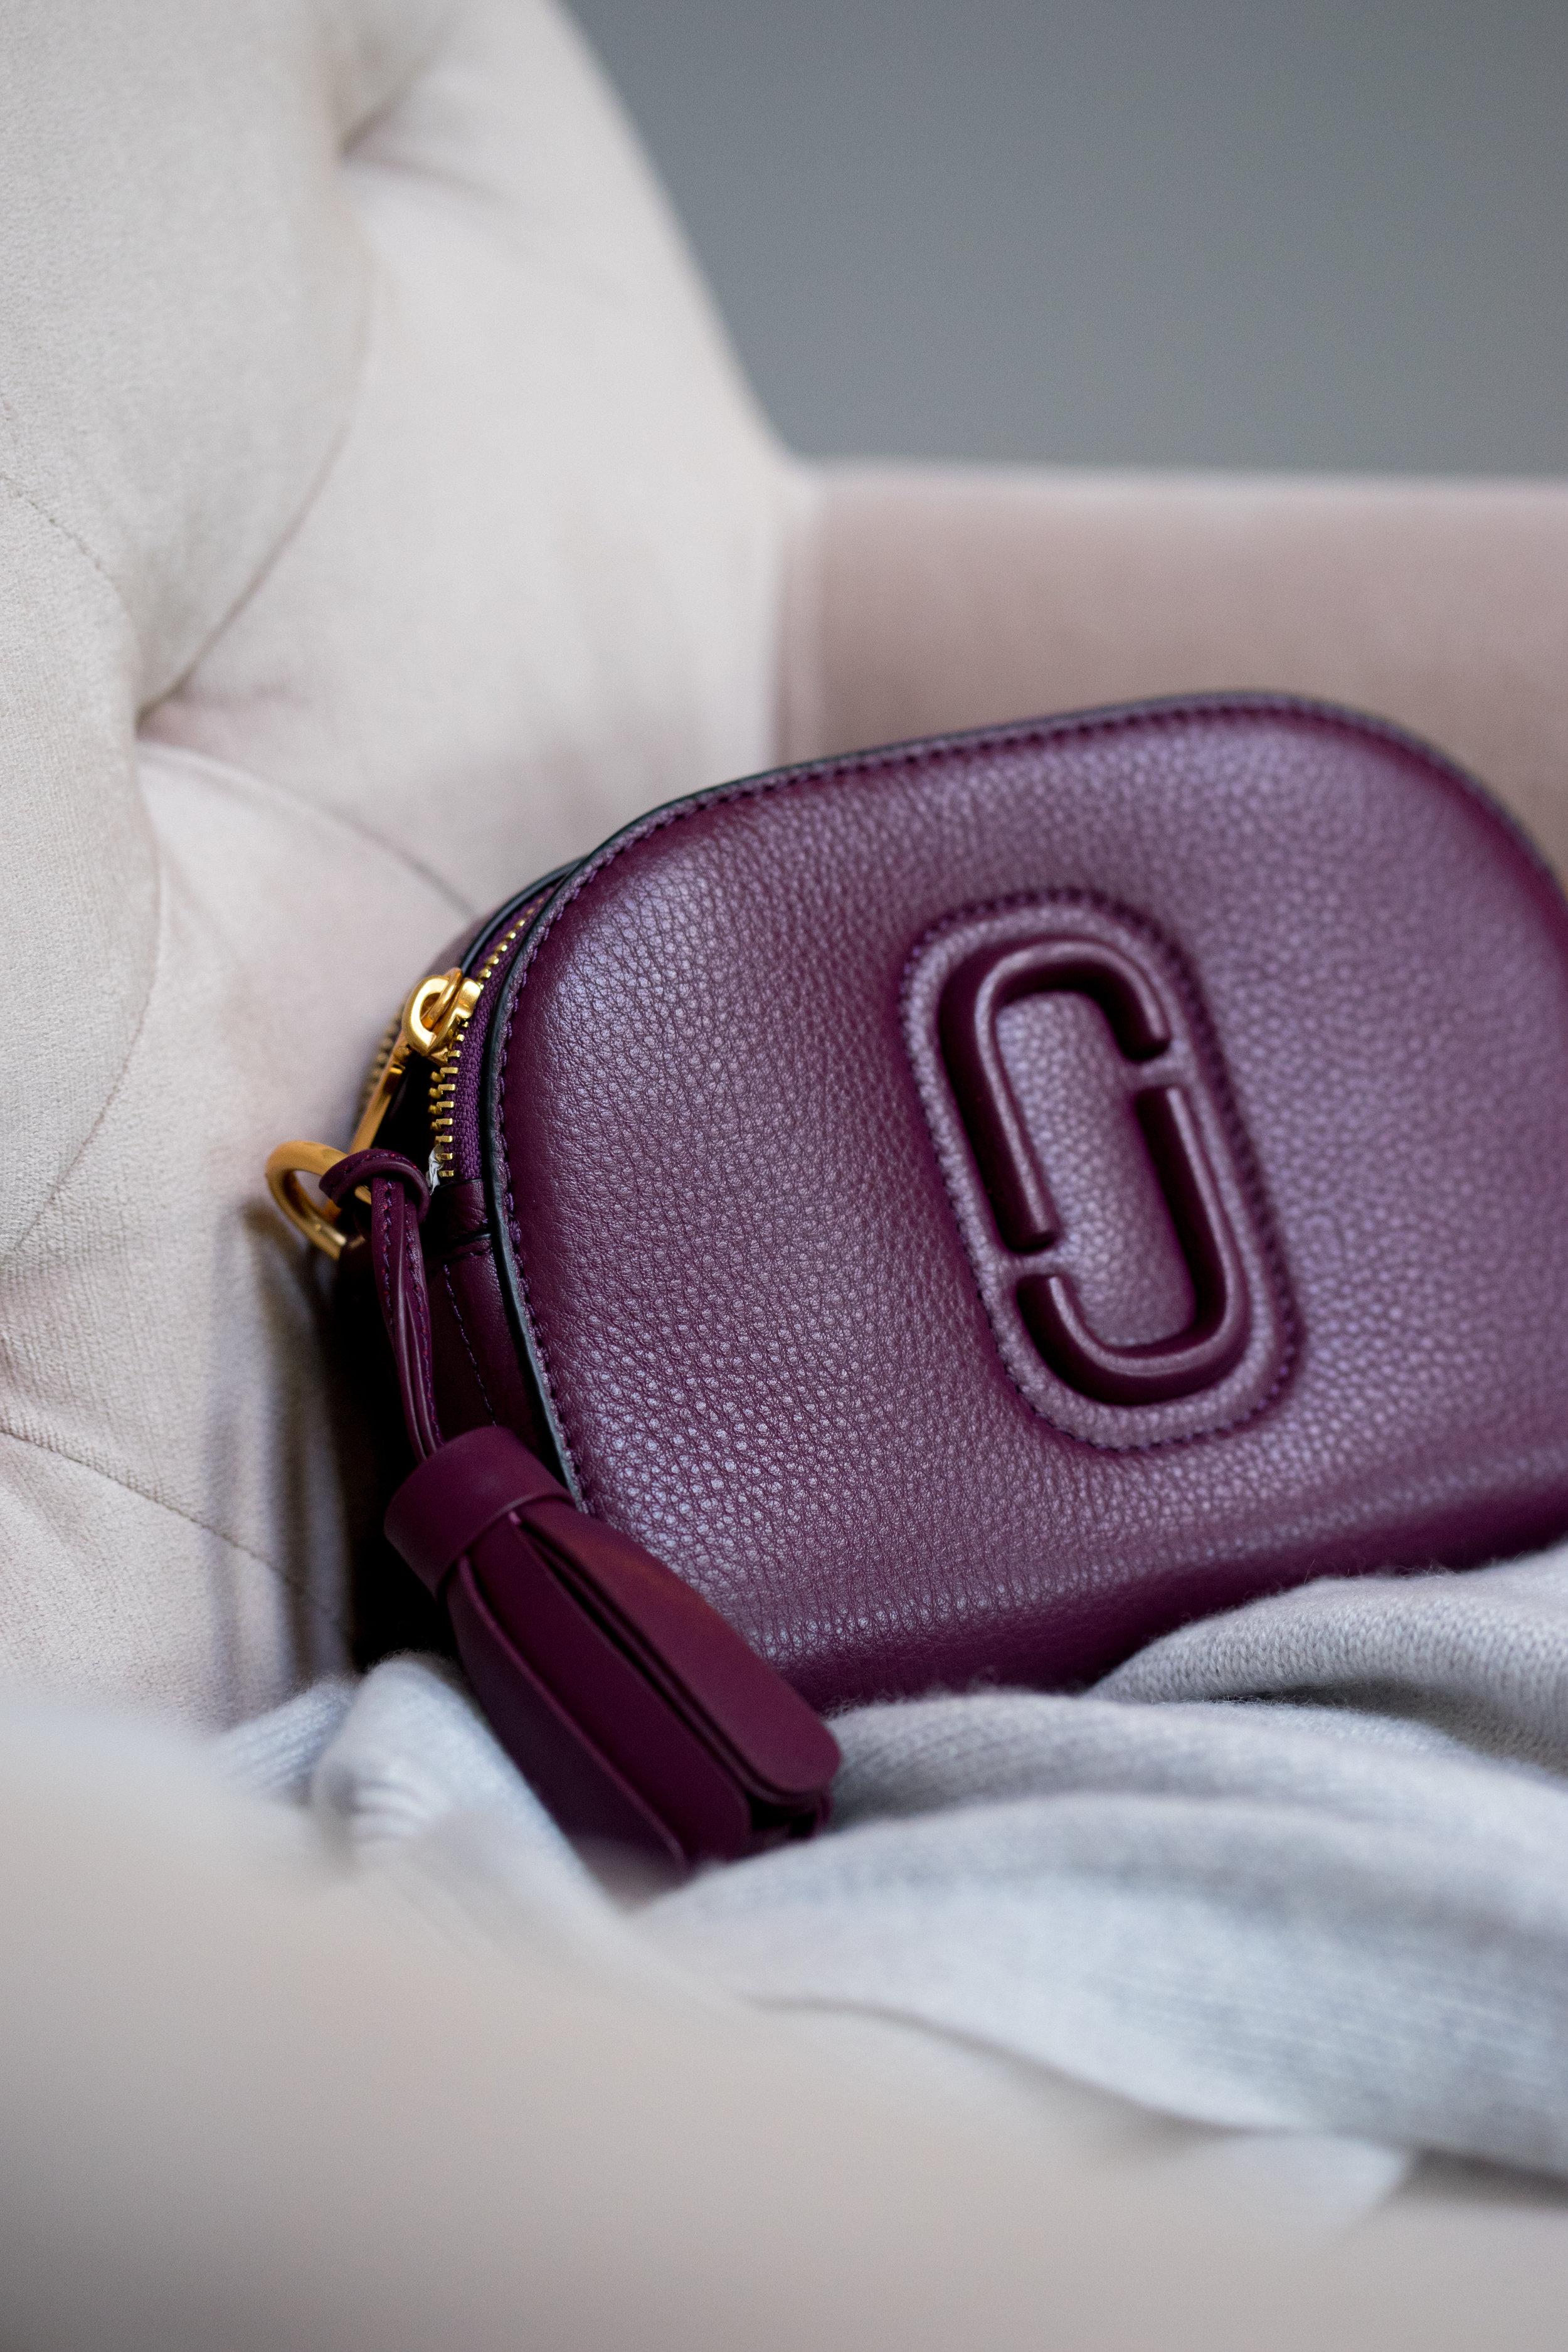 Maggie a la Mode - Black Friday Wish List Marc Jacobs Shutter Camera Crossbody Bag